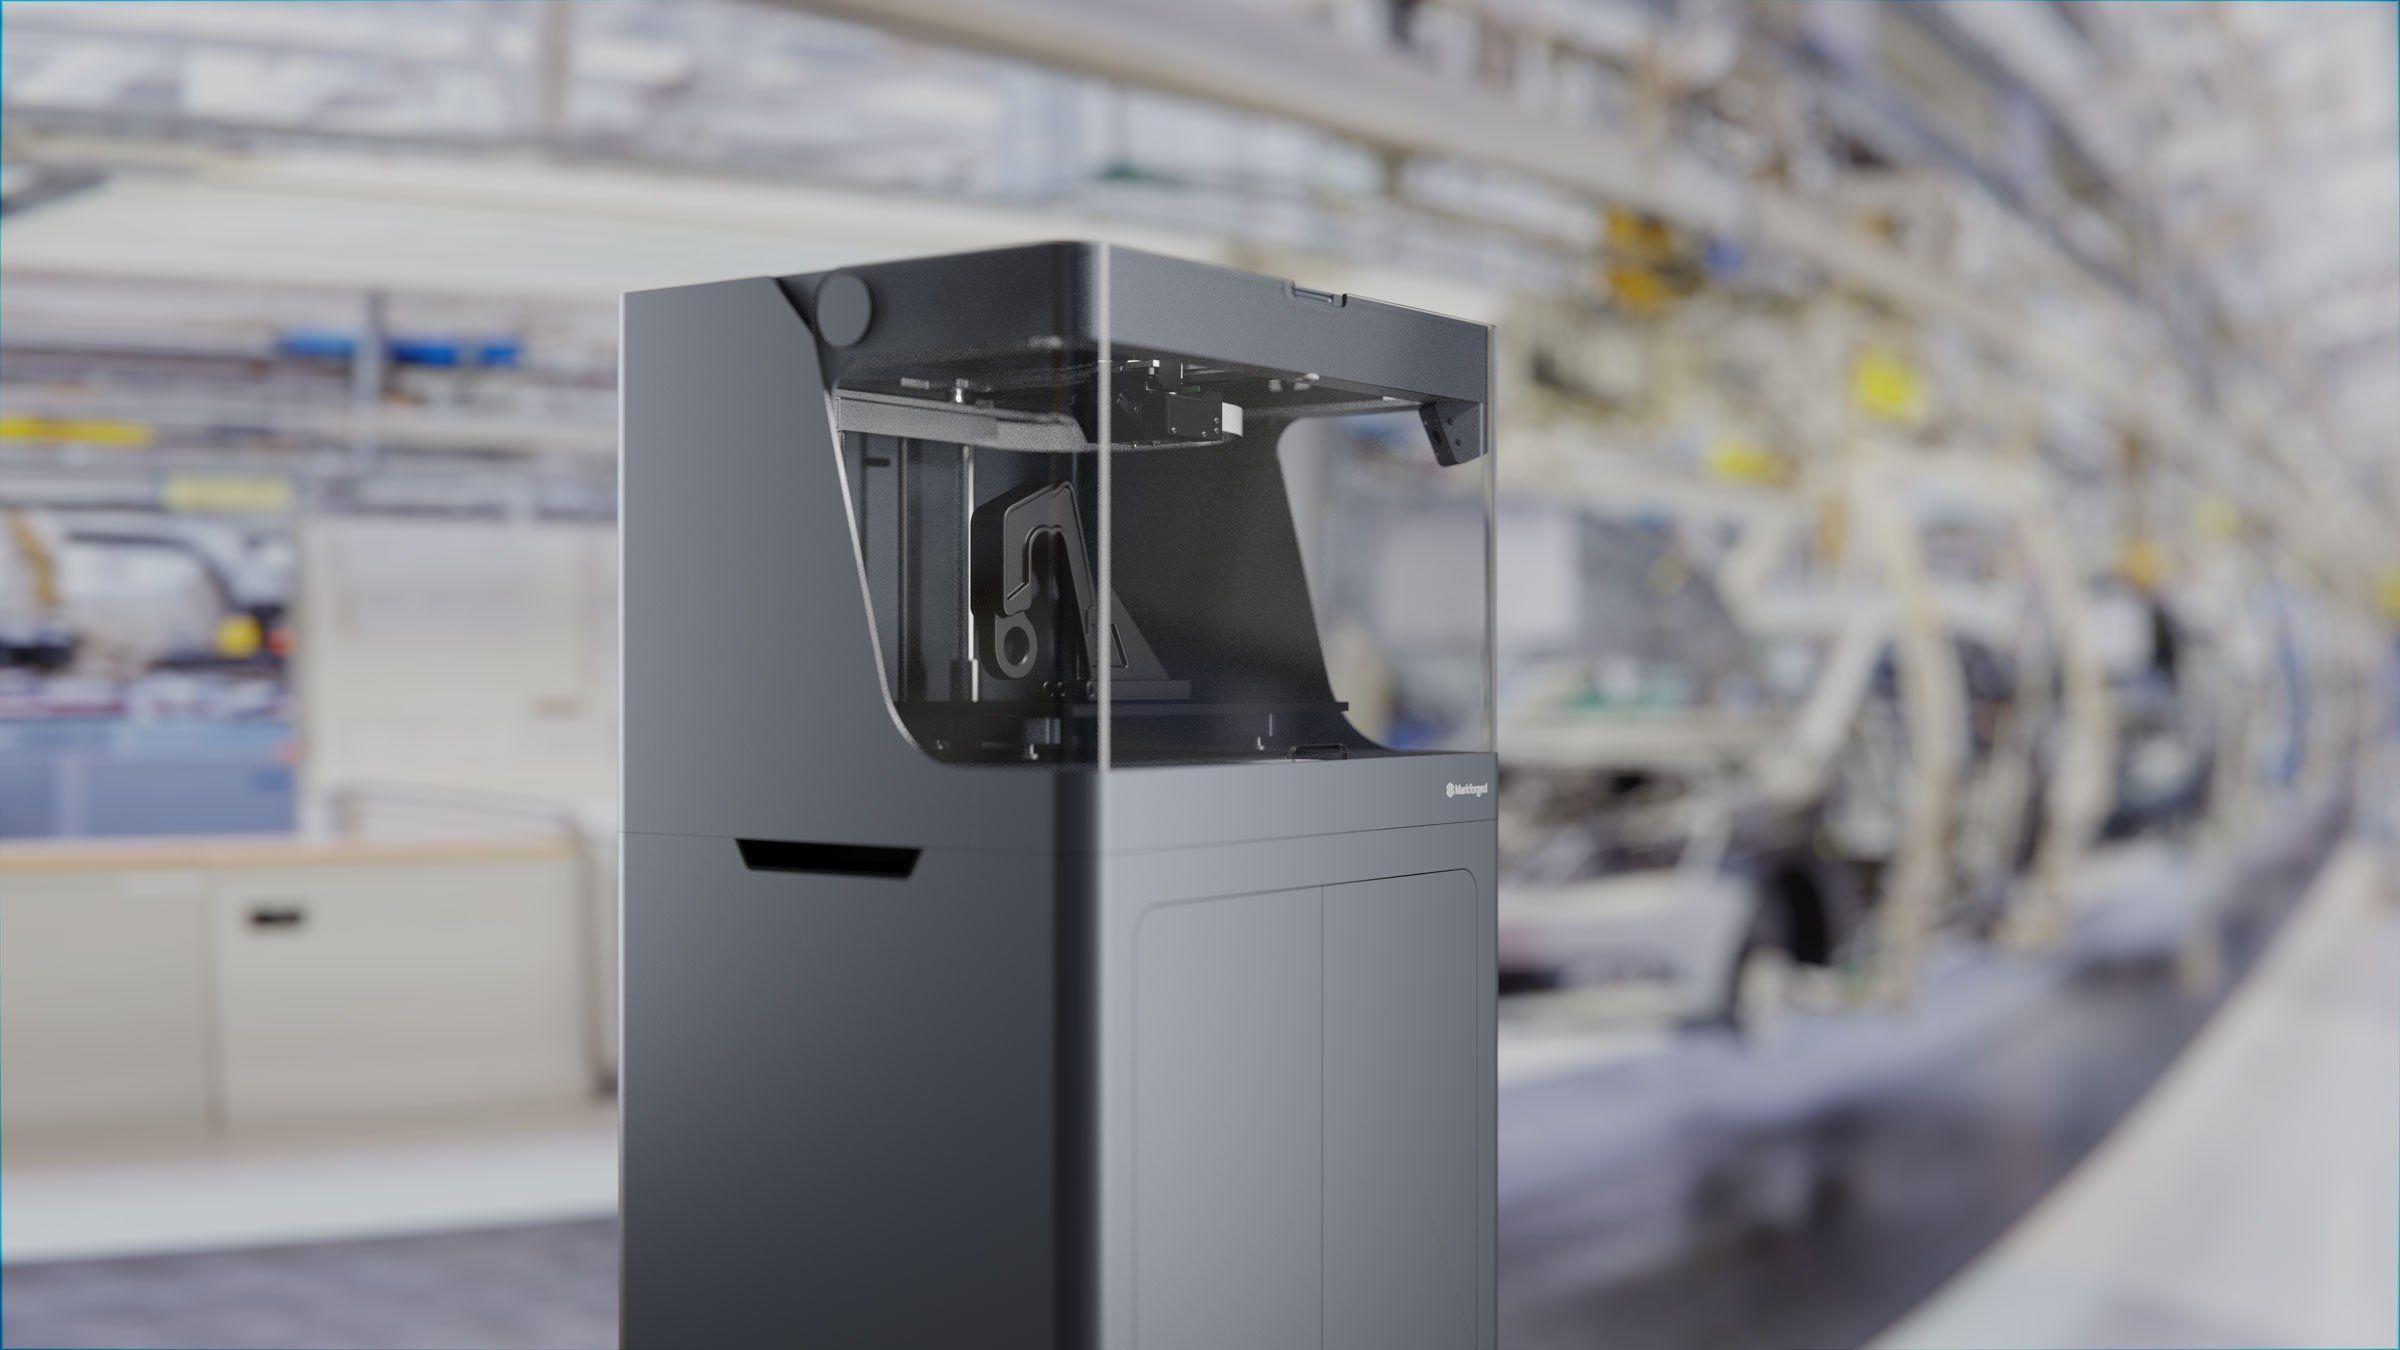 Rimage 480i Printer Driver For Mac